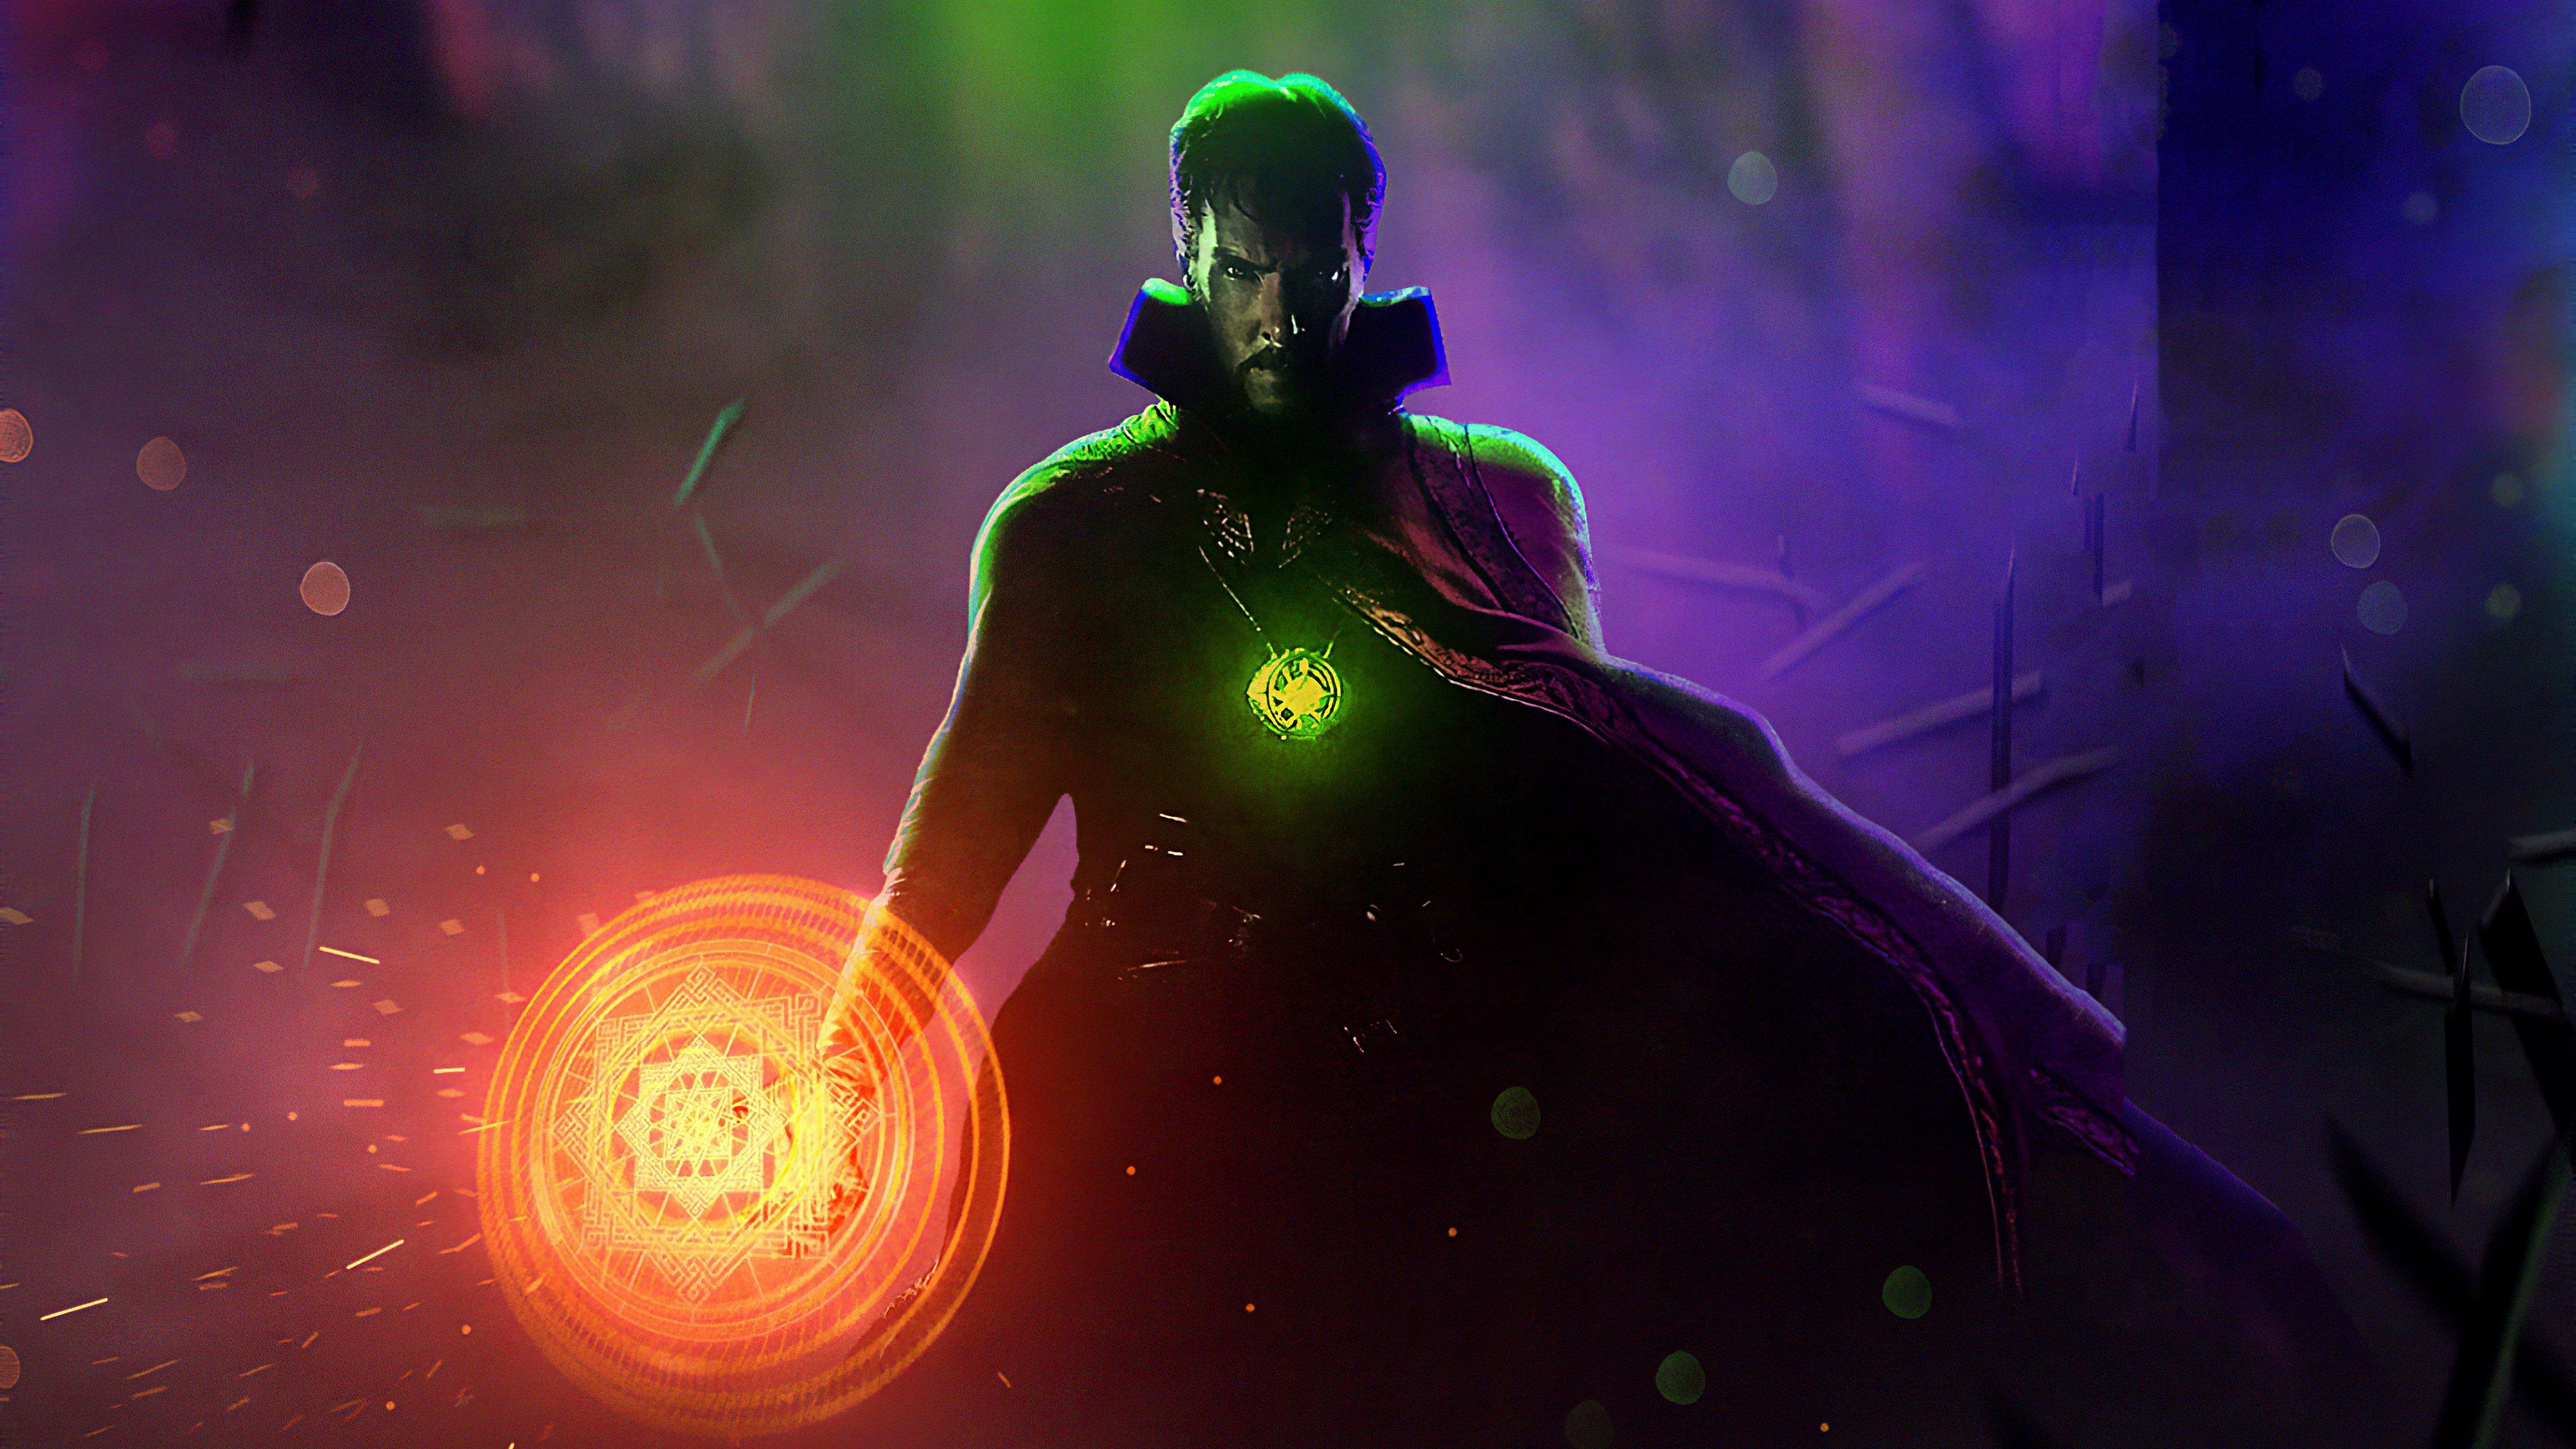 Doctor Strange Artwork Wallpaper 4k Ultra HD ID:5444